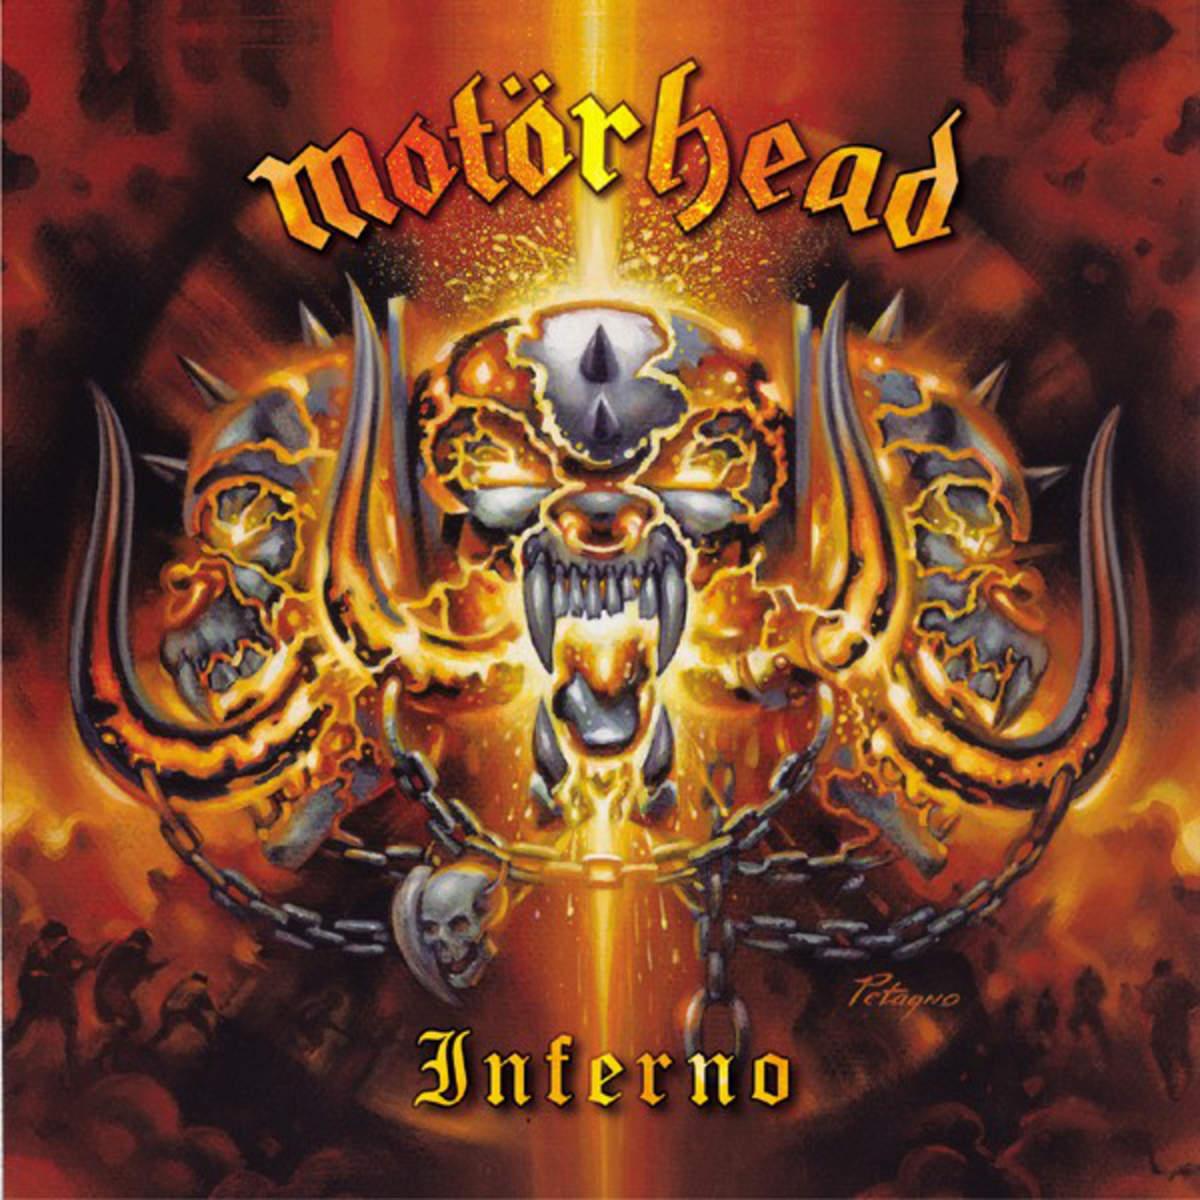 CD Review: MotorheadInferno